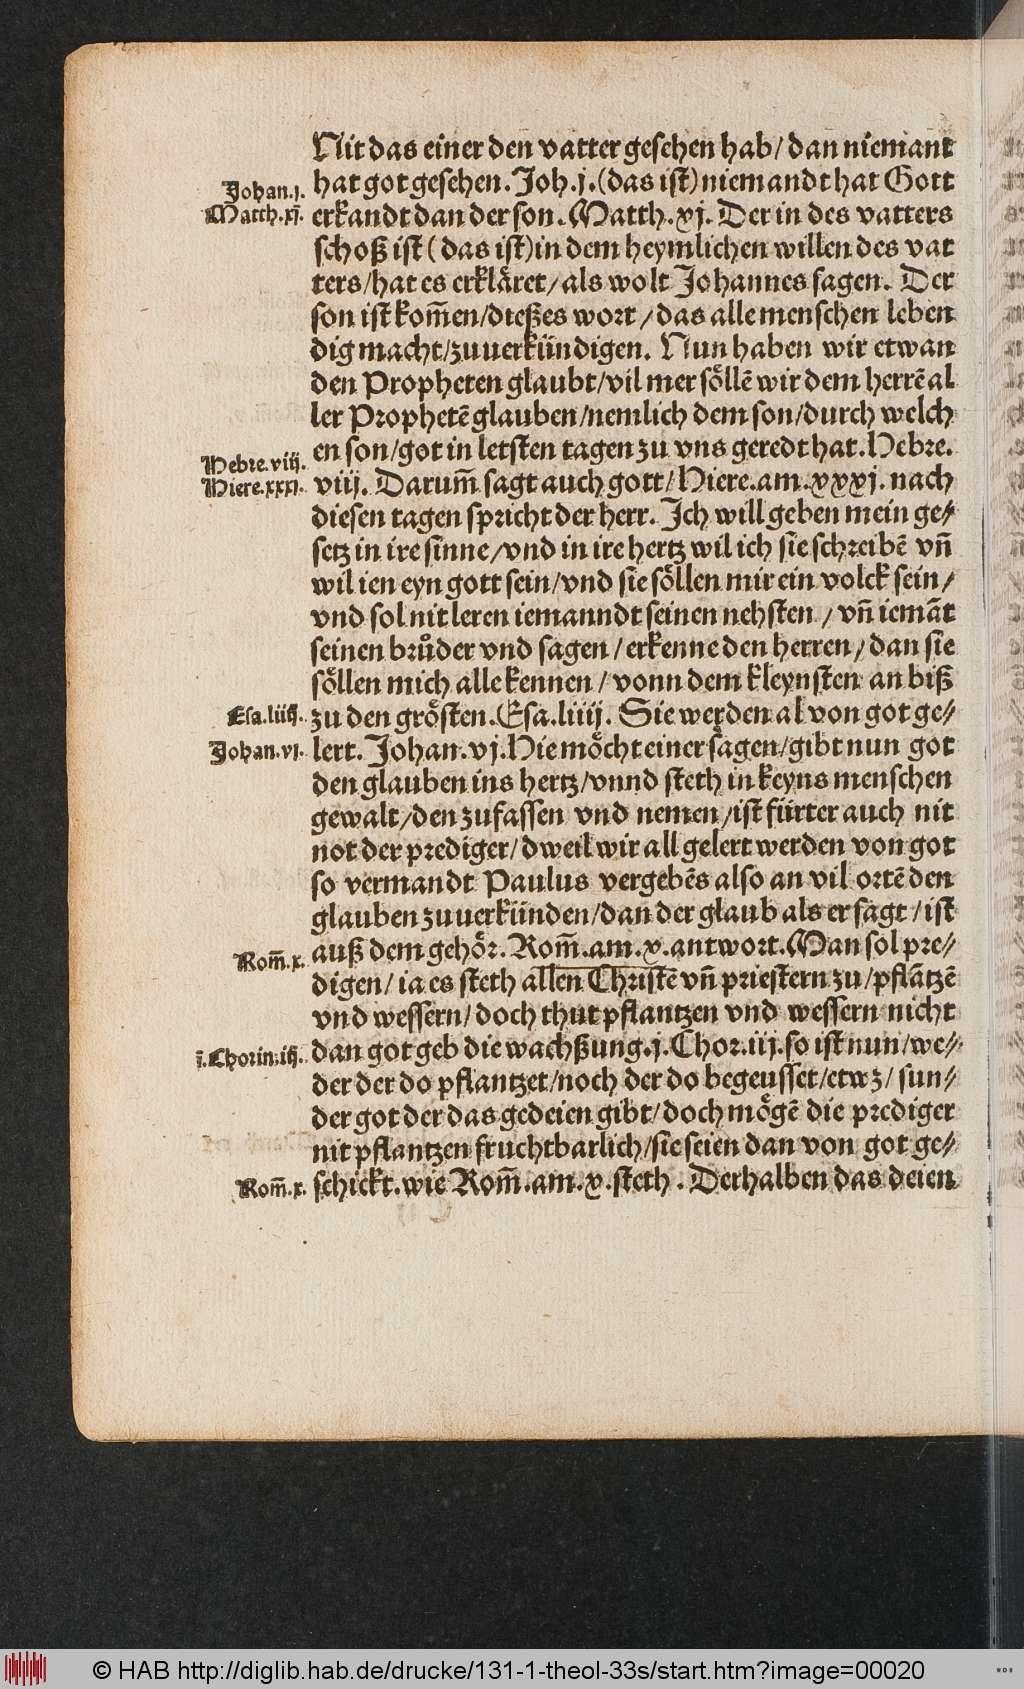 http://diglib.hab.de/drucke/131-1-theol-33s/00020.jpg